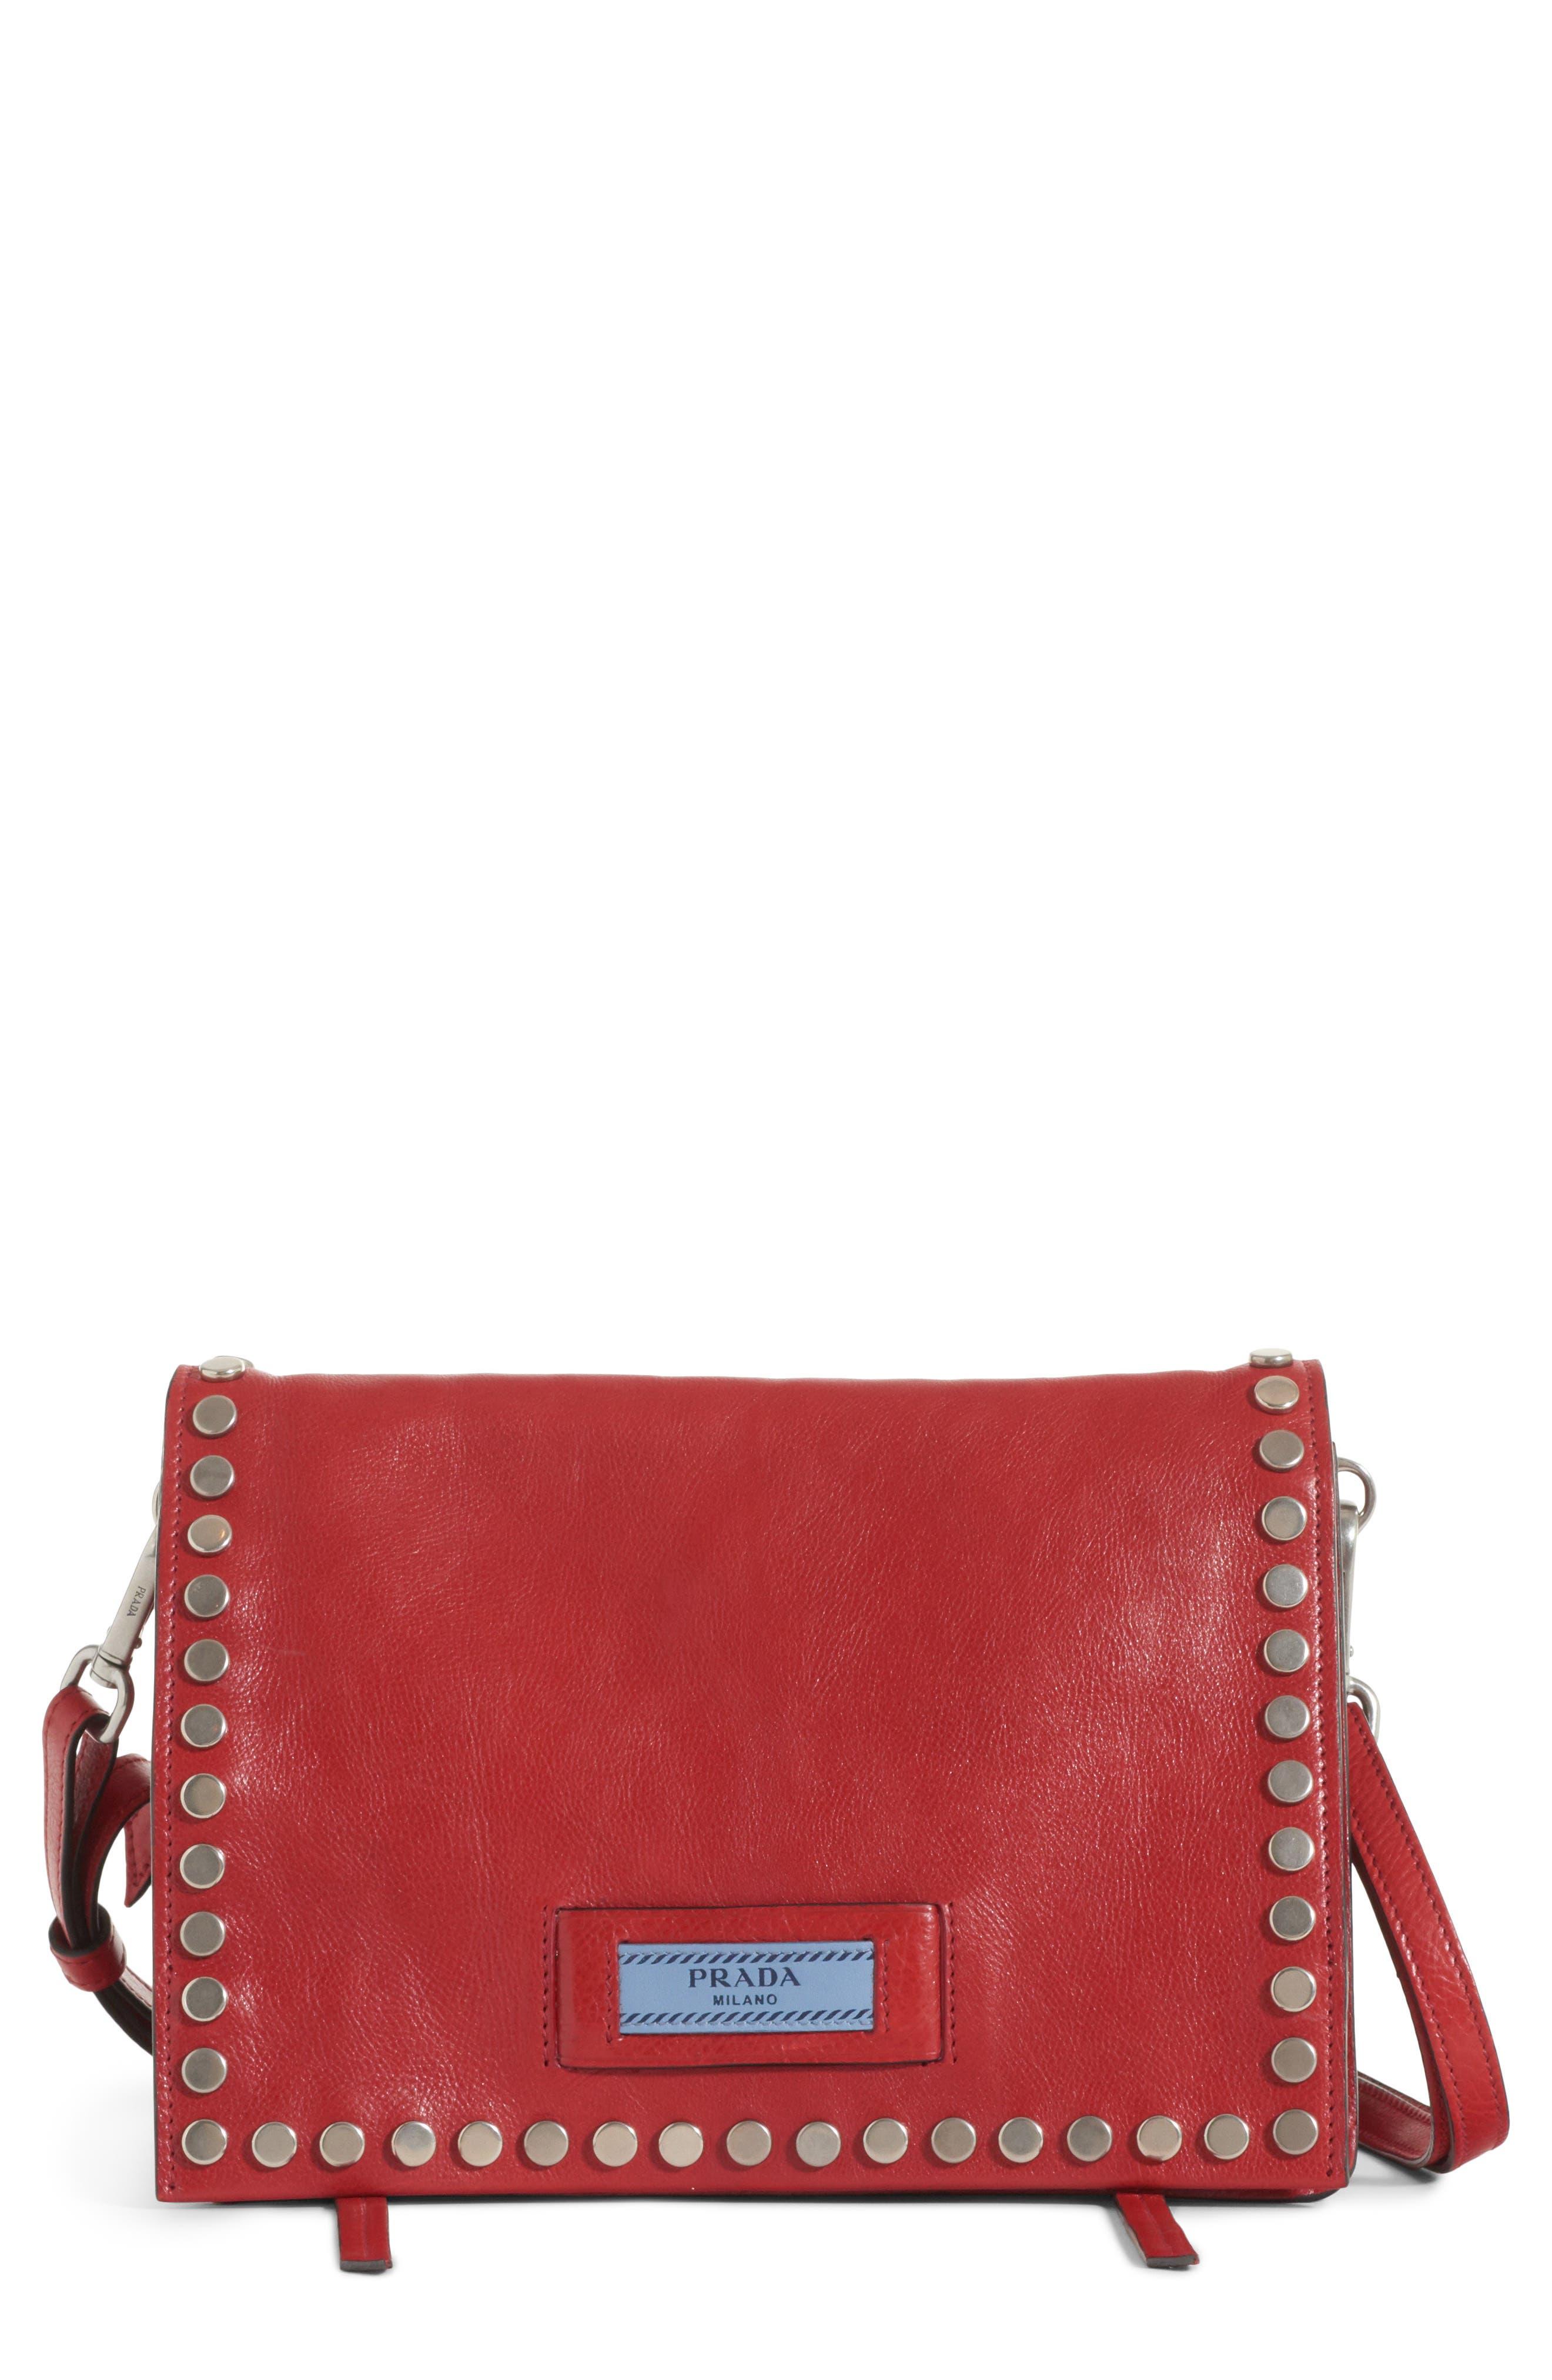 61879f6fc48a Prada Crossbody Bags